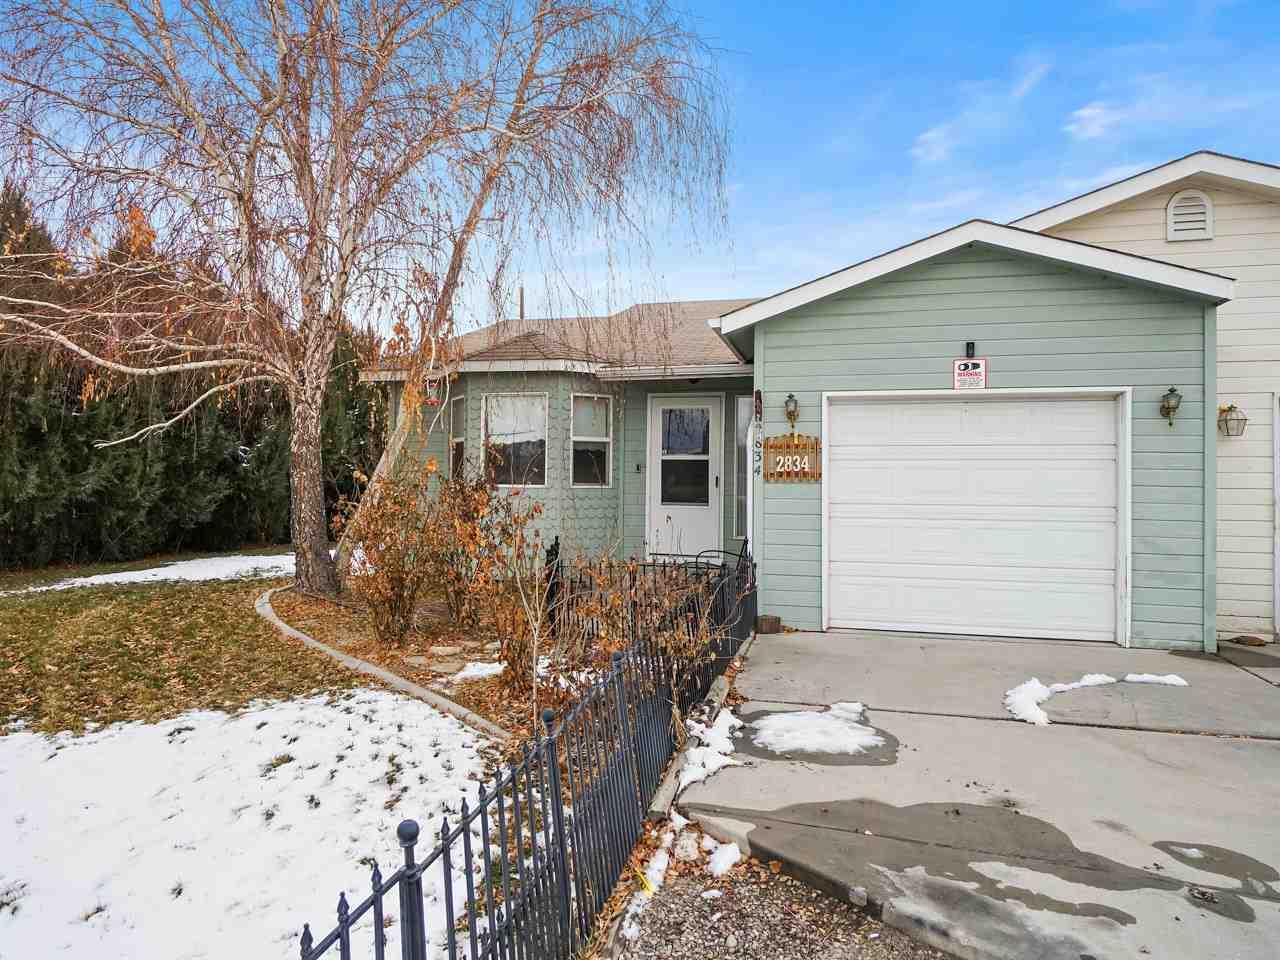 Morningside 2 Real Estate Listings Main Image